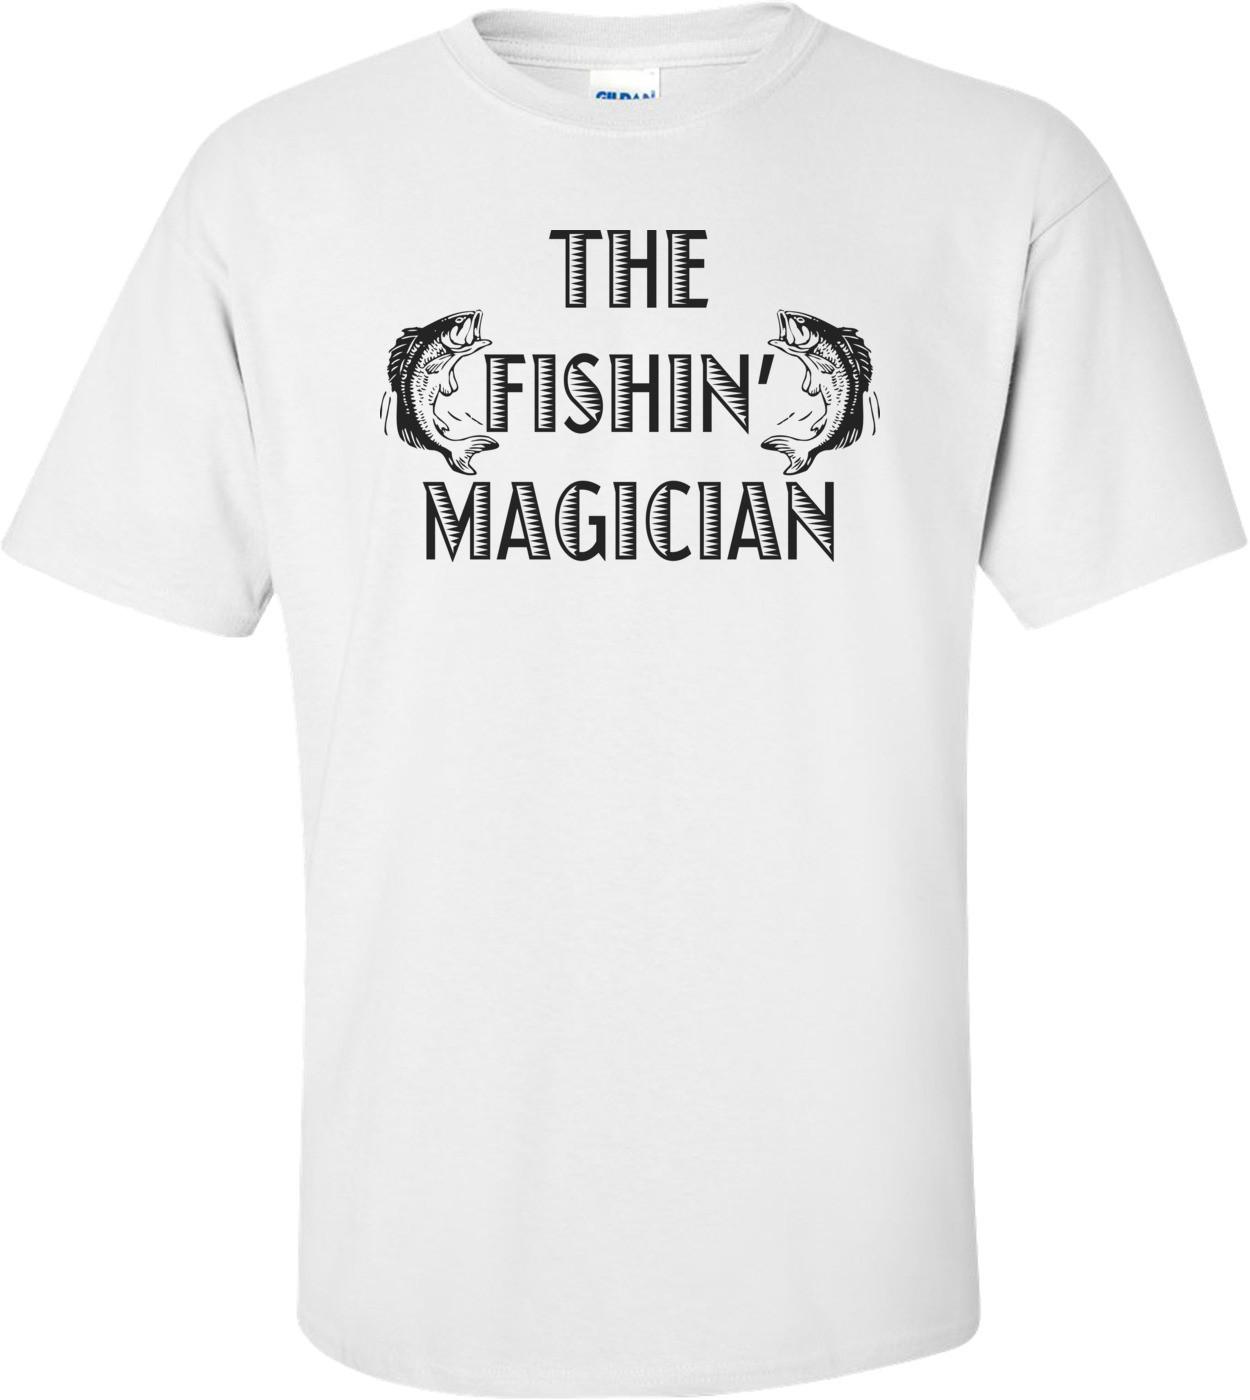 The Fishin' Magician Funny T-shirt